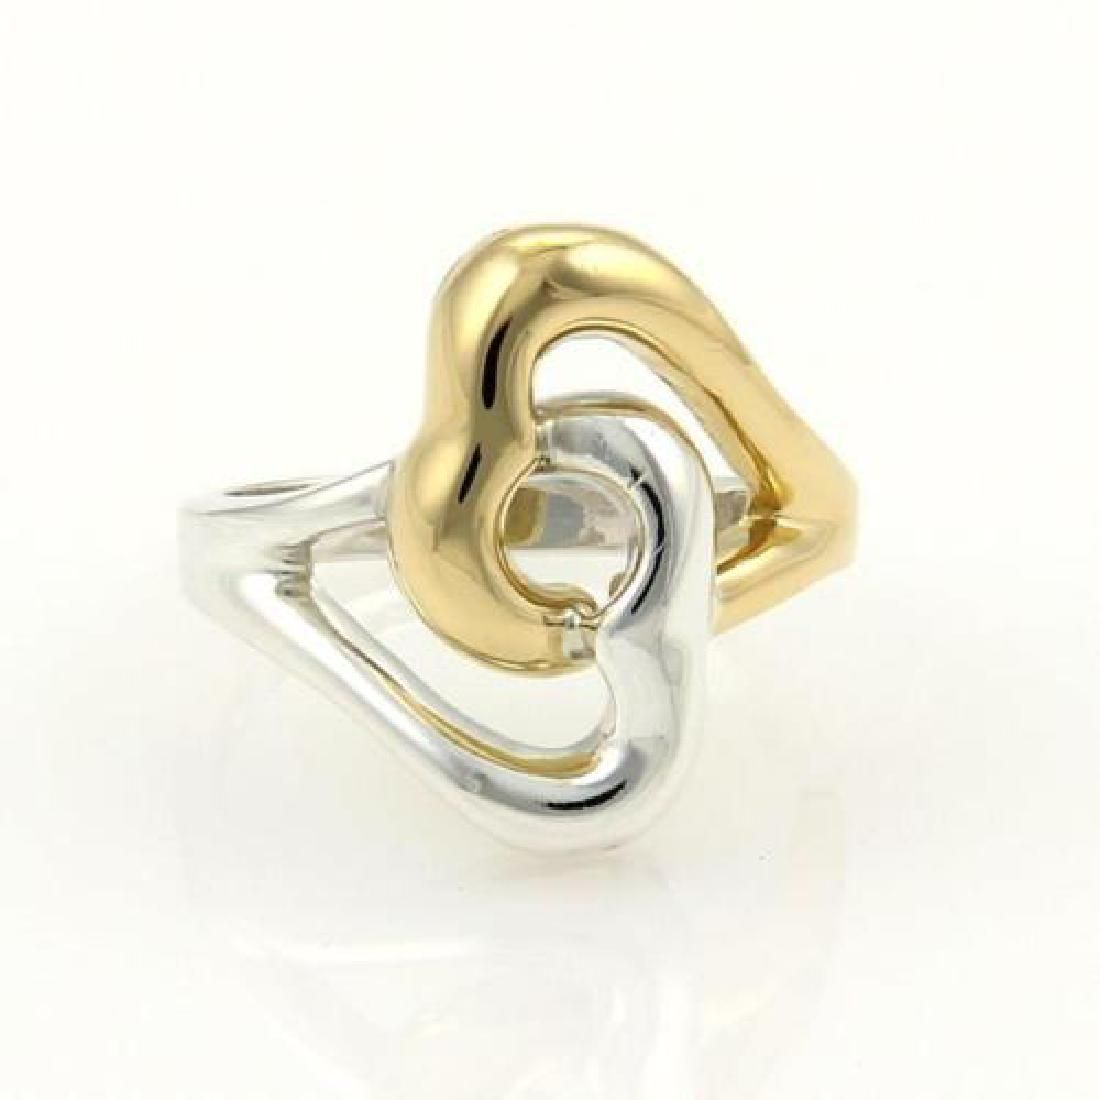 Tiffany & Co. 18k Gold & Silver Double Heart Ring